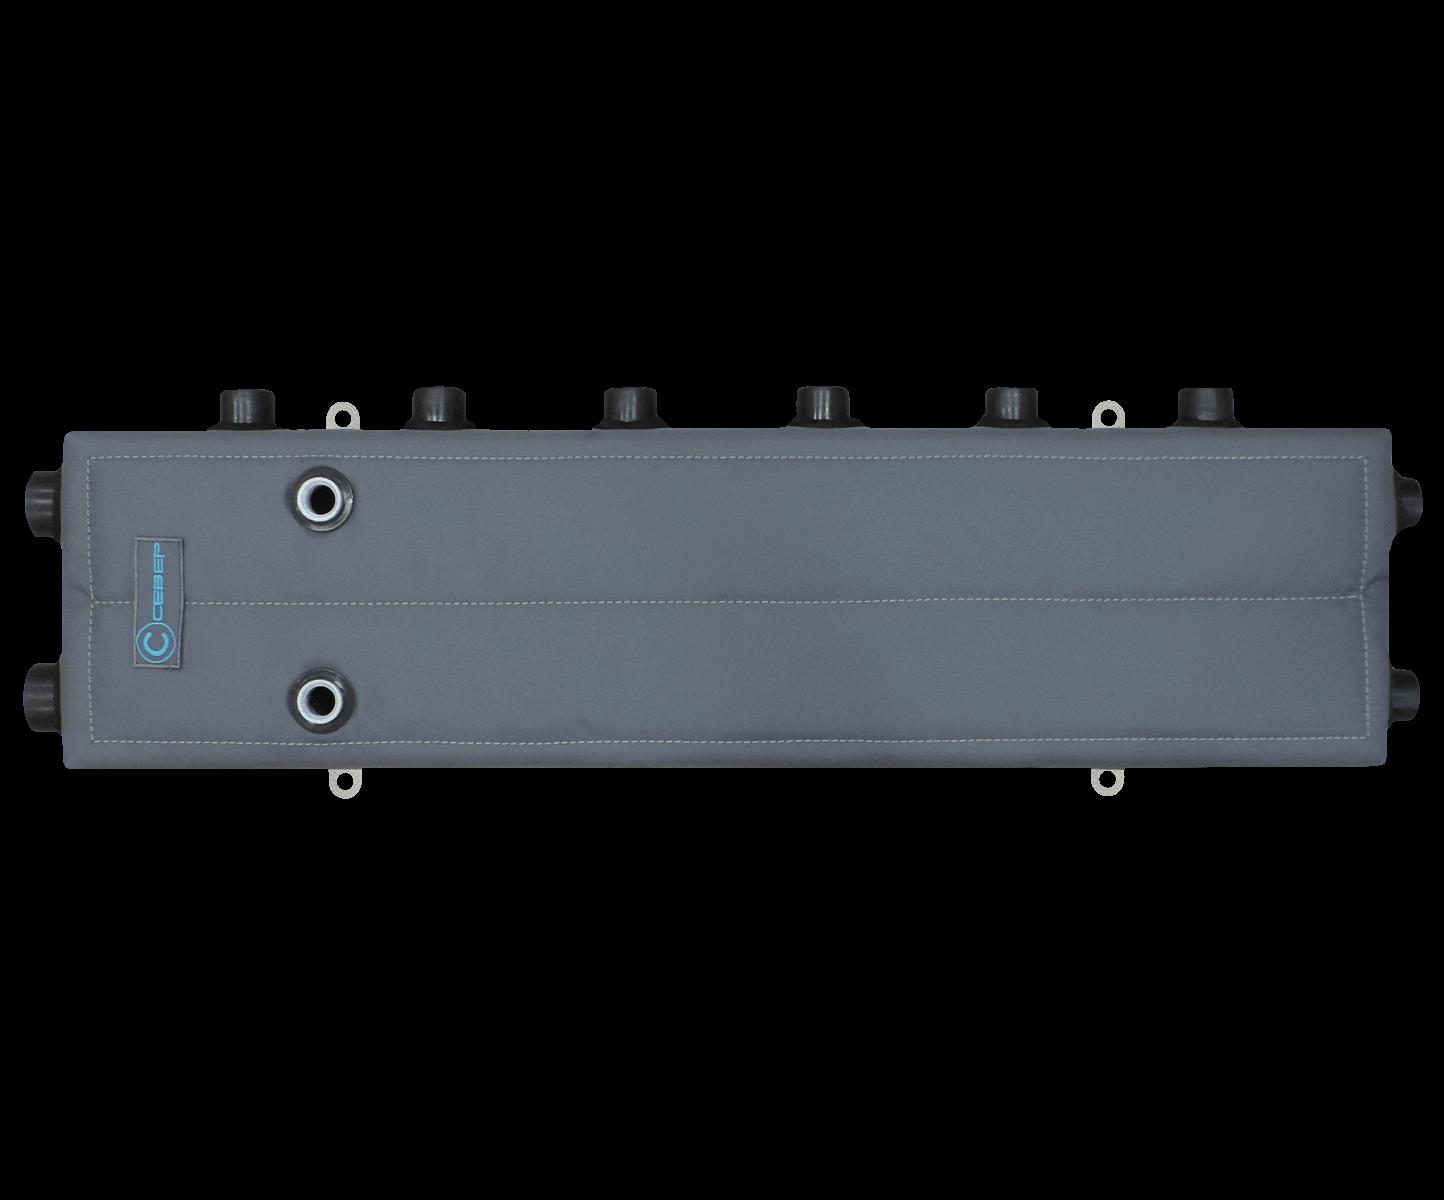 Теплоизоляция, теплоизоляционный чехол для гидрообвязки Север КМ4